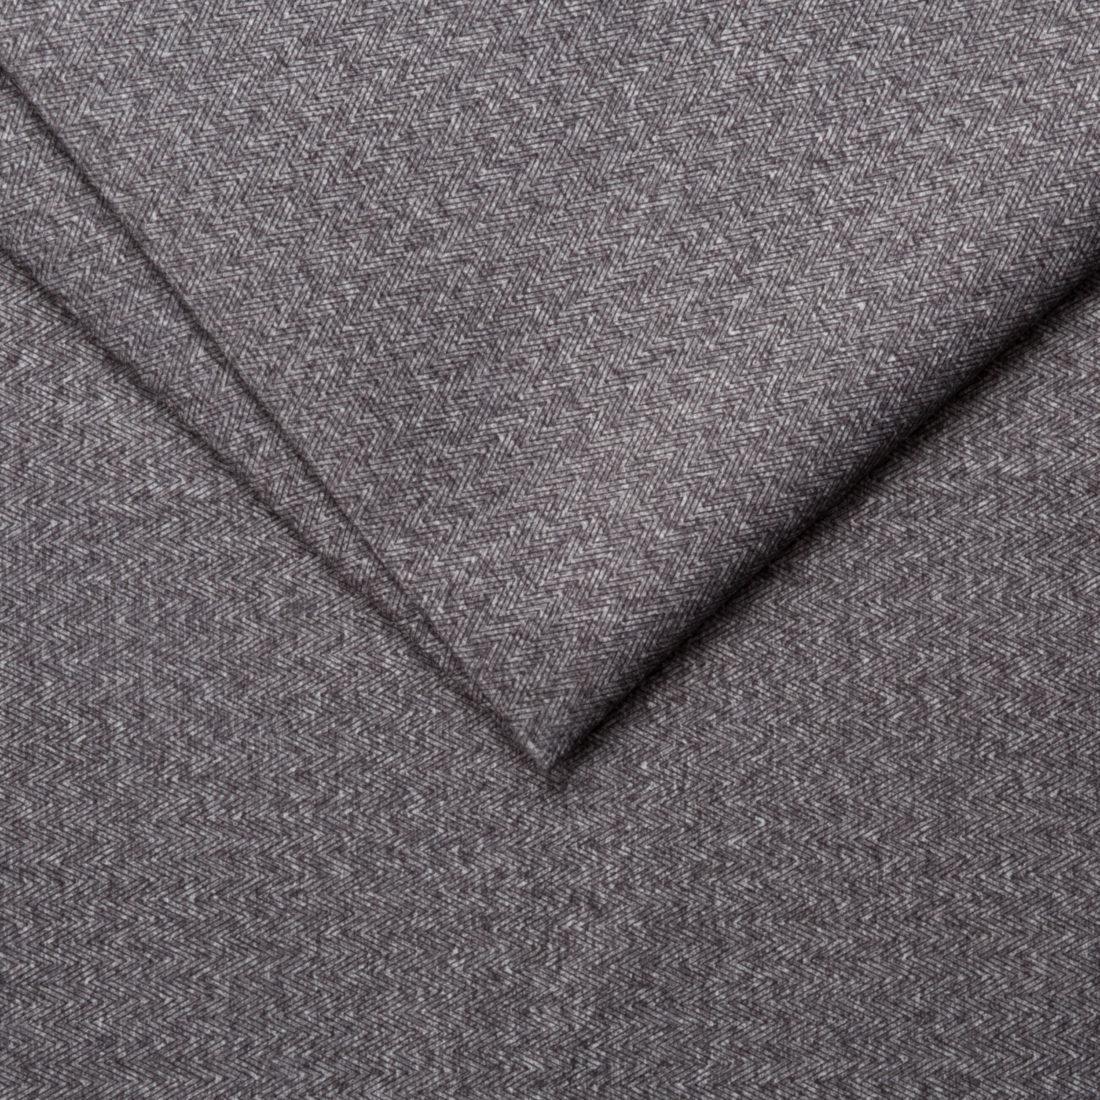 Меблева тканина Next 15 Ash, велюр